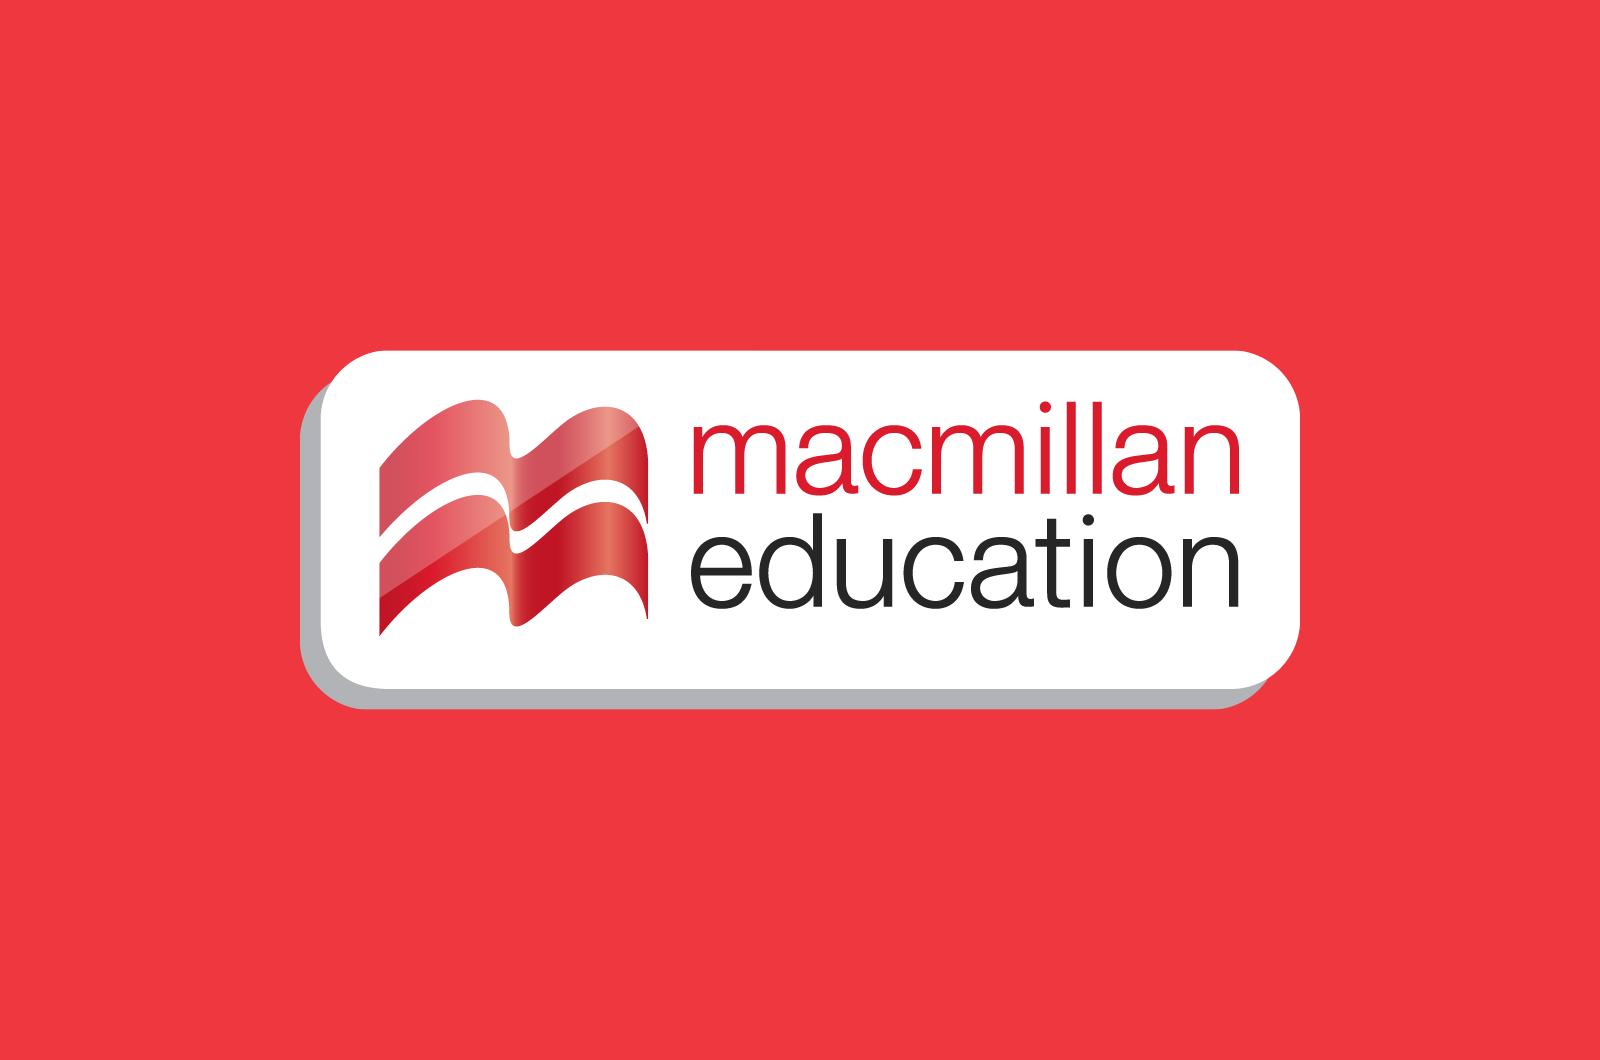 Macmillan logo - lozenge